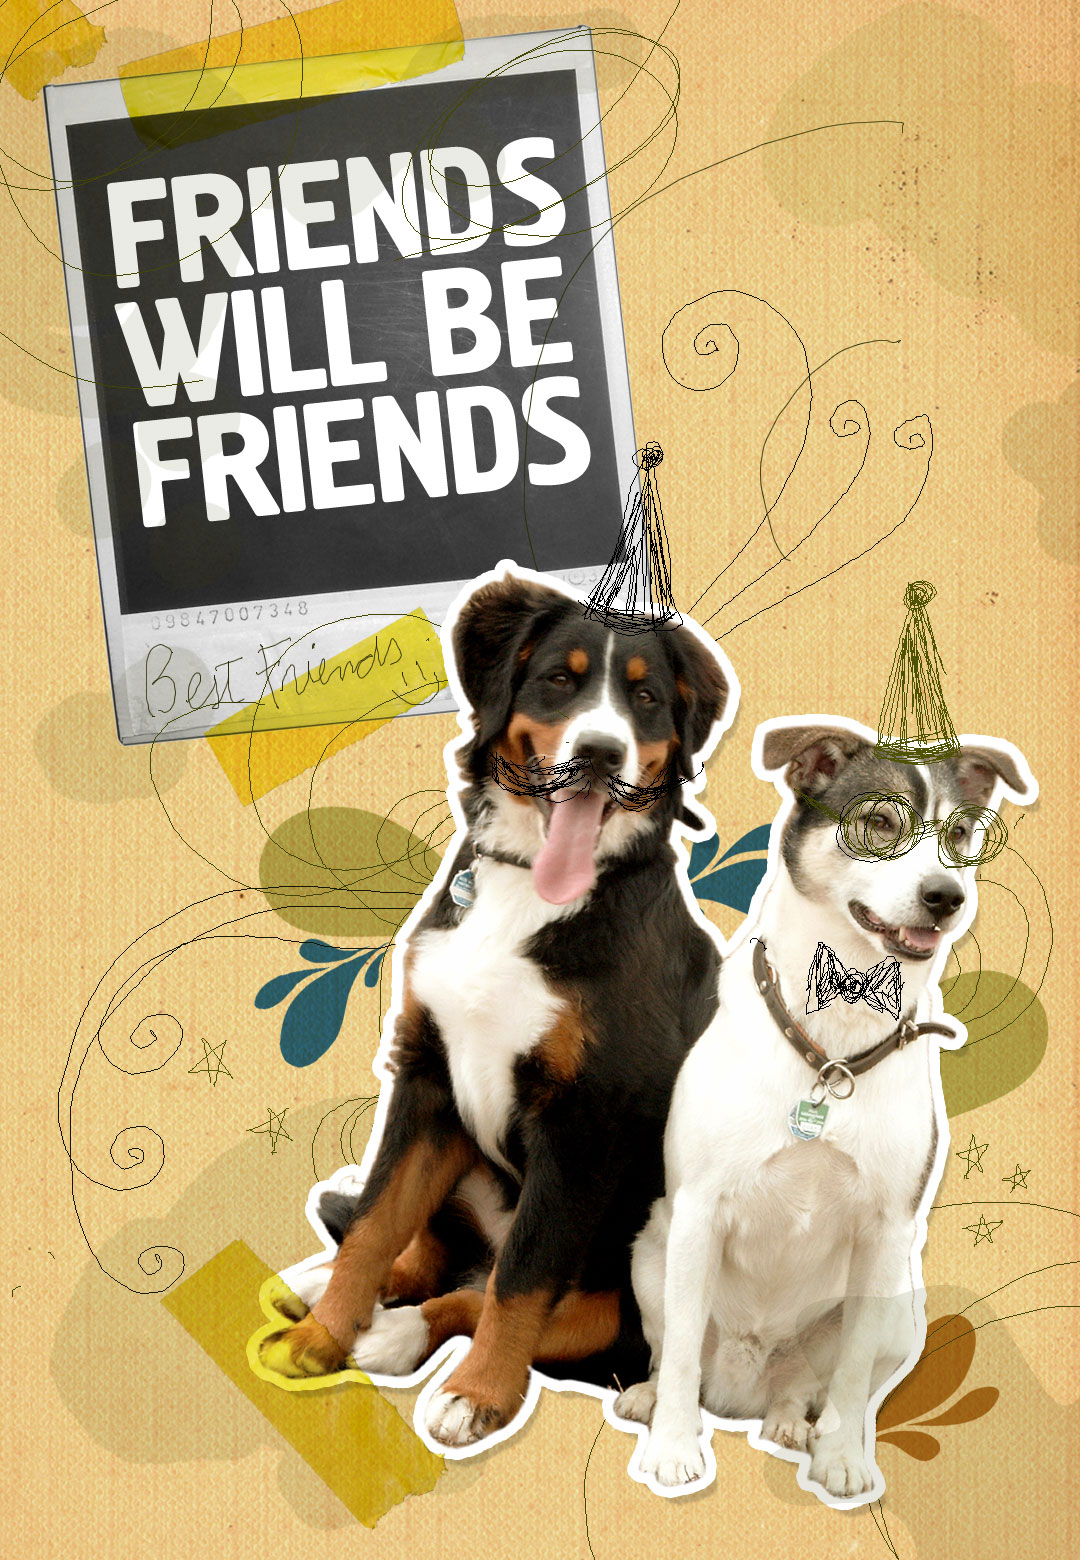 Friends will be friends…